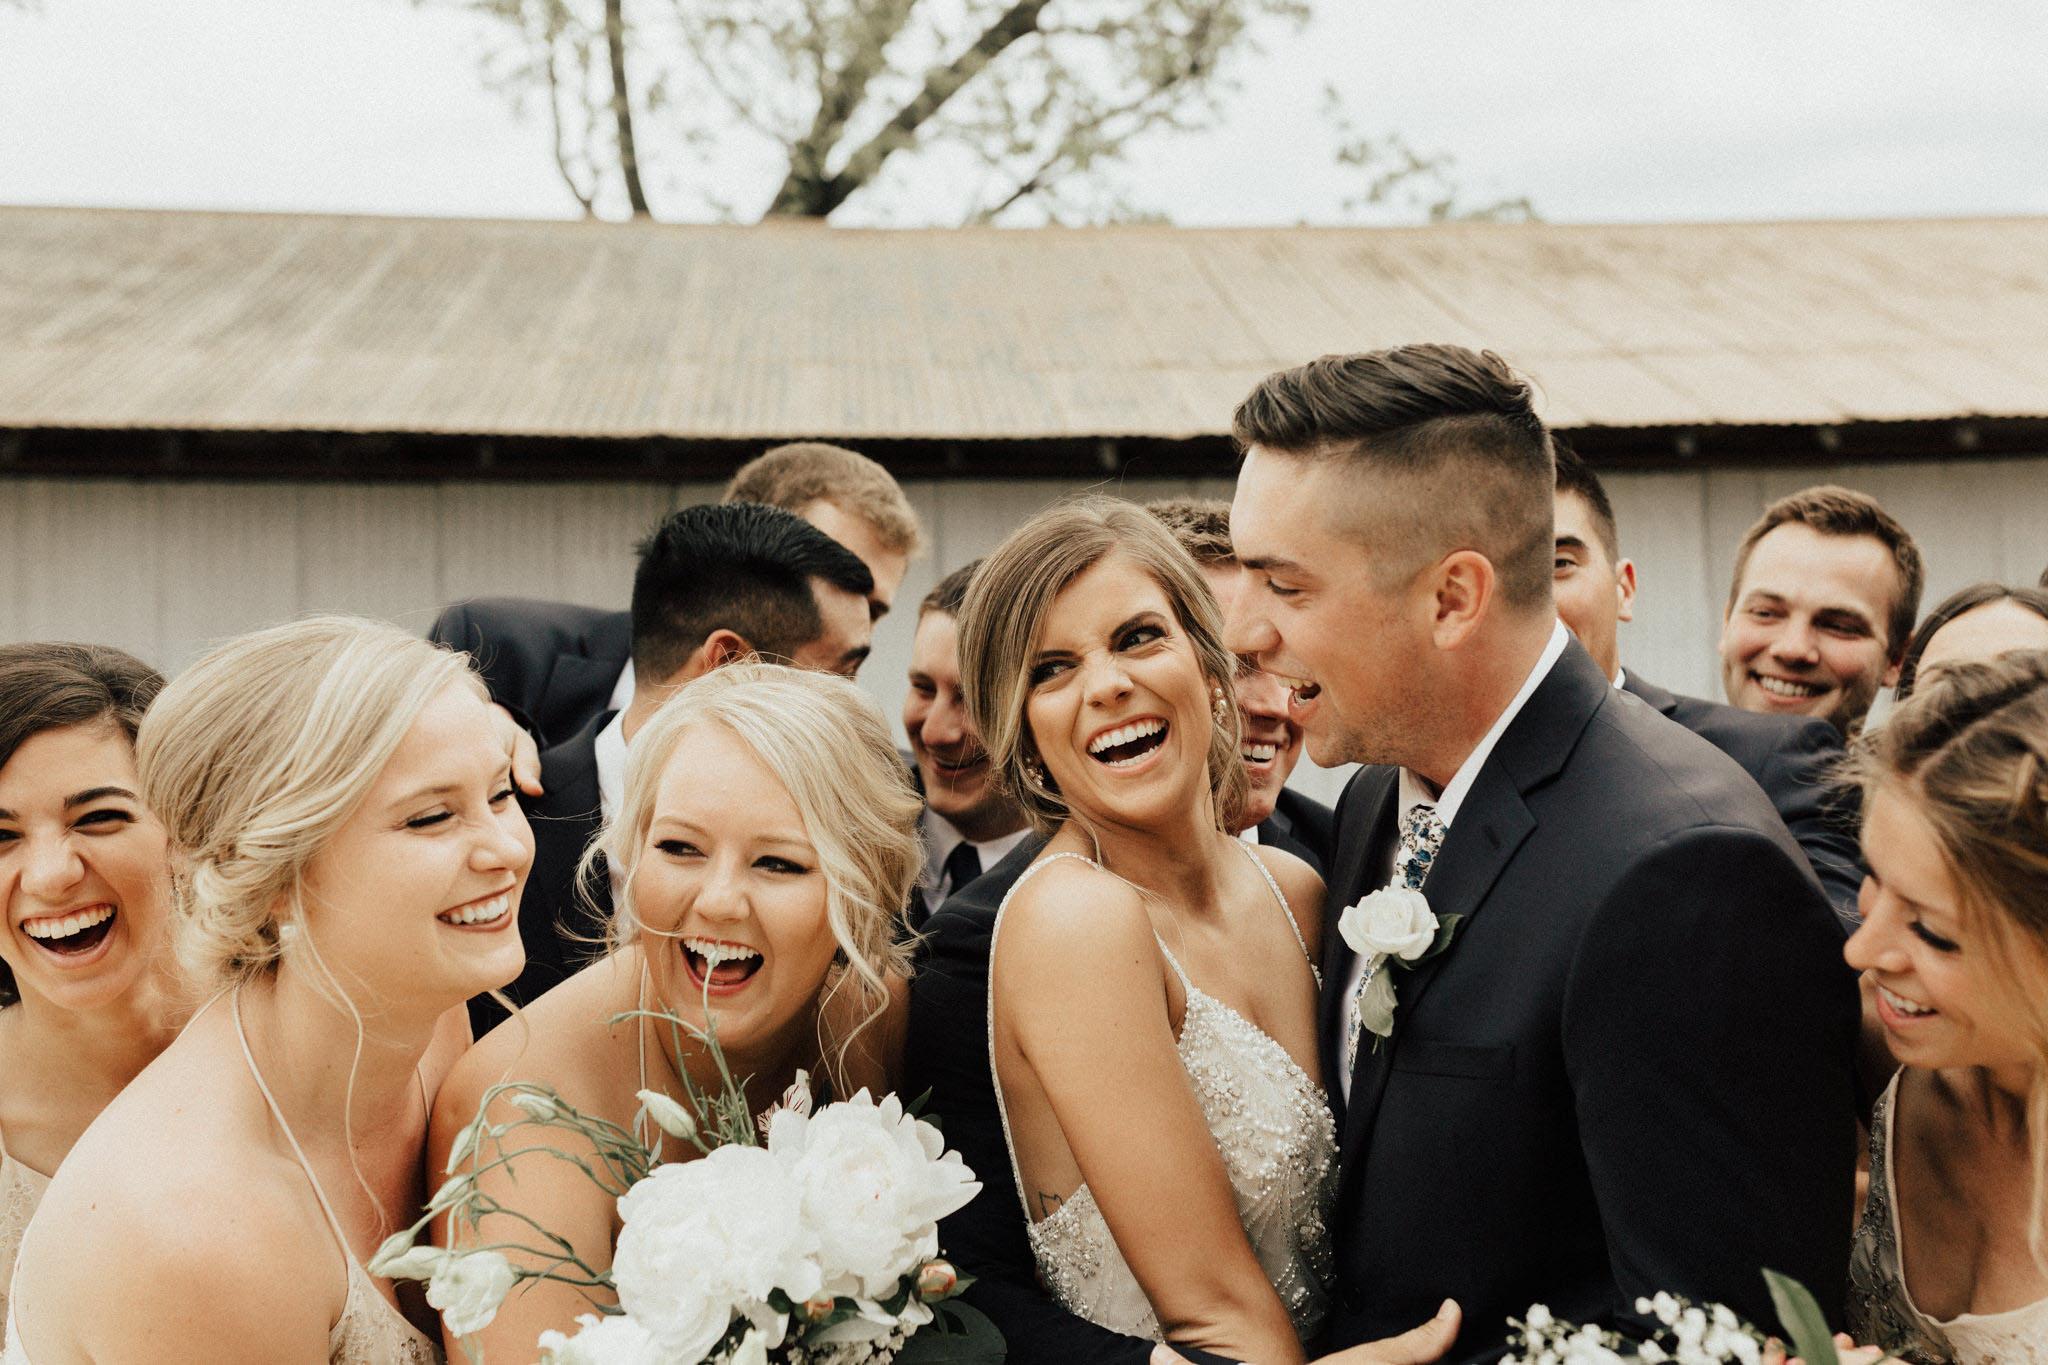 Arizona-Adventure-Elopement-Wedding-Photographer-26.jpg